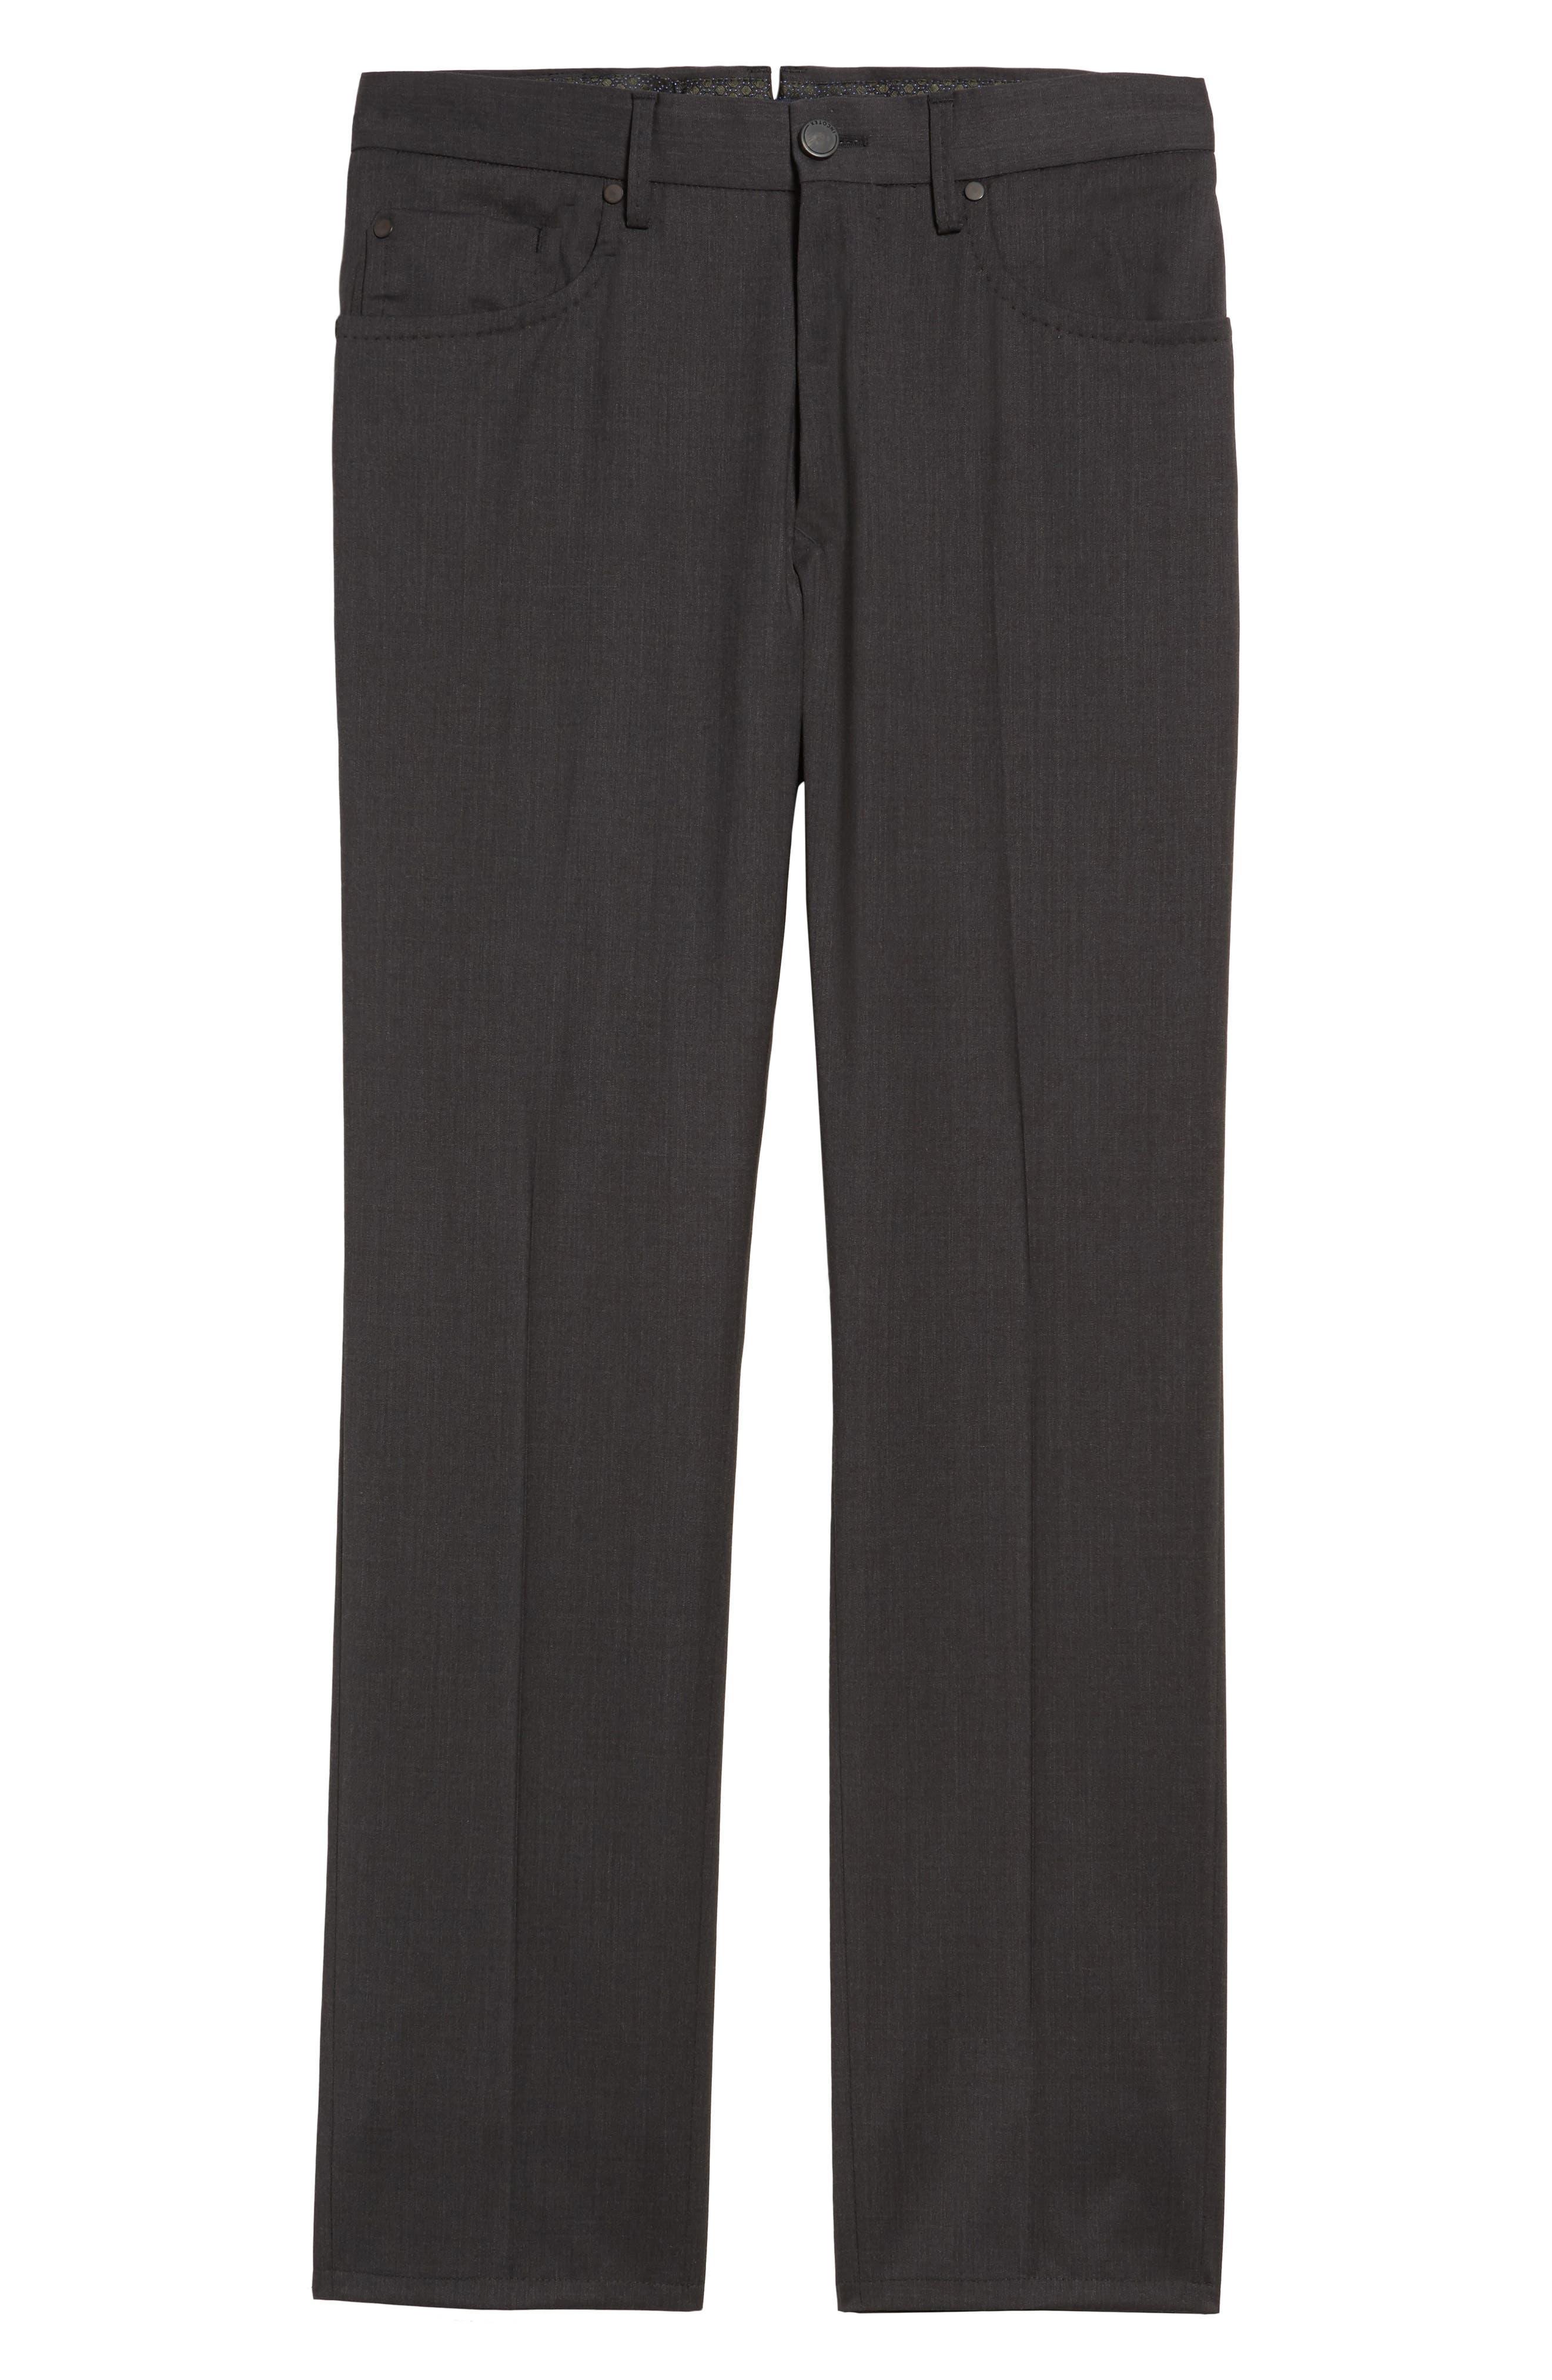 Five-Pocket Stretch Wool Pants,                             Alternate thumbnail 6, color,                             015